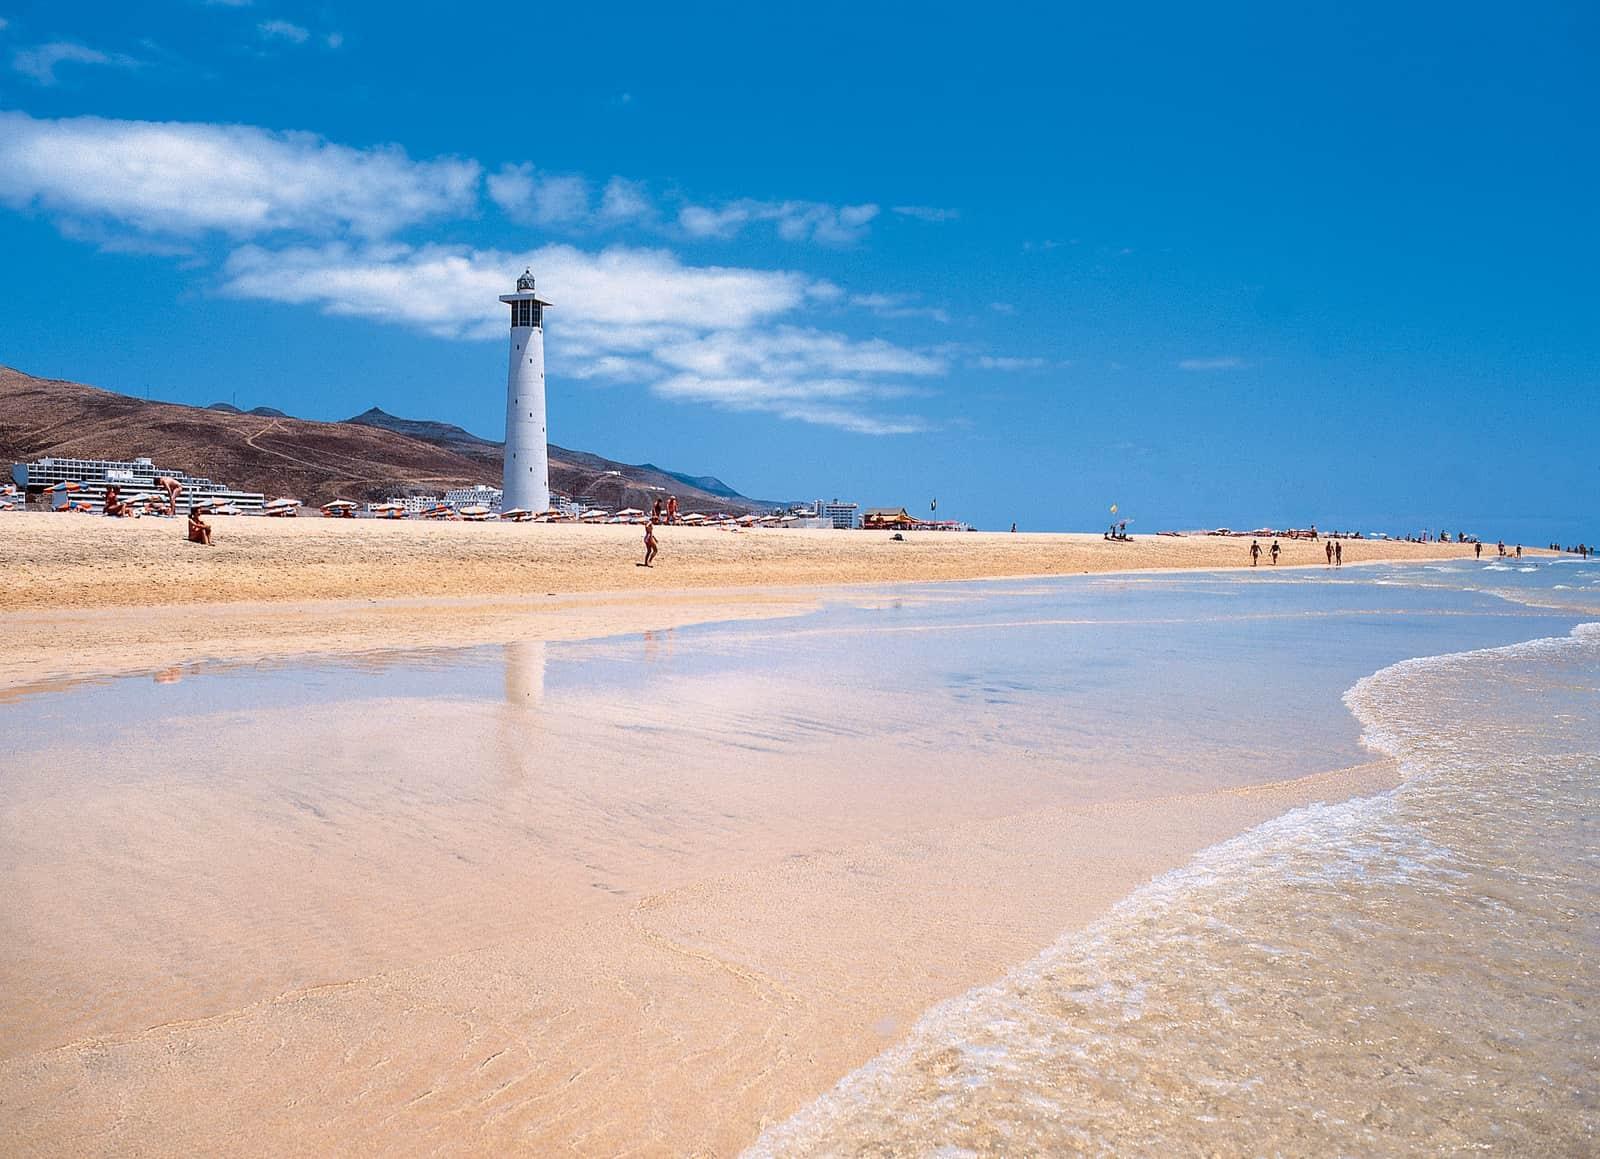 Jandia, Morro Jable Fuerteventura Canary Islands, Fuerteventura beaches, XQ El Palacete